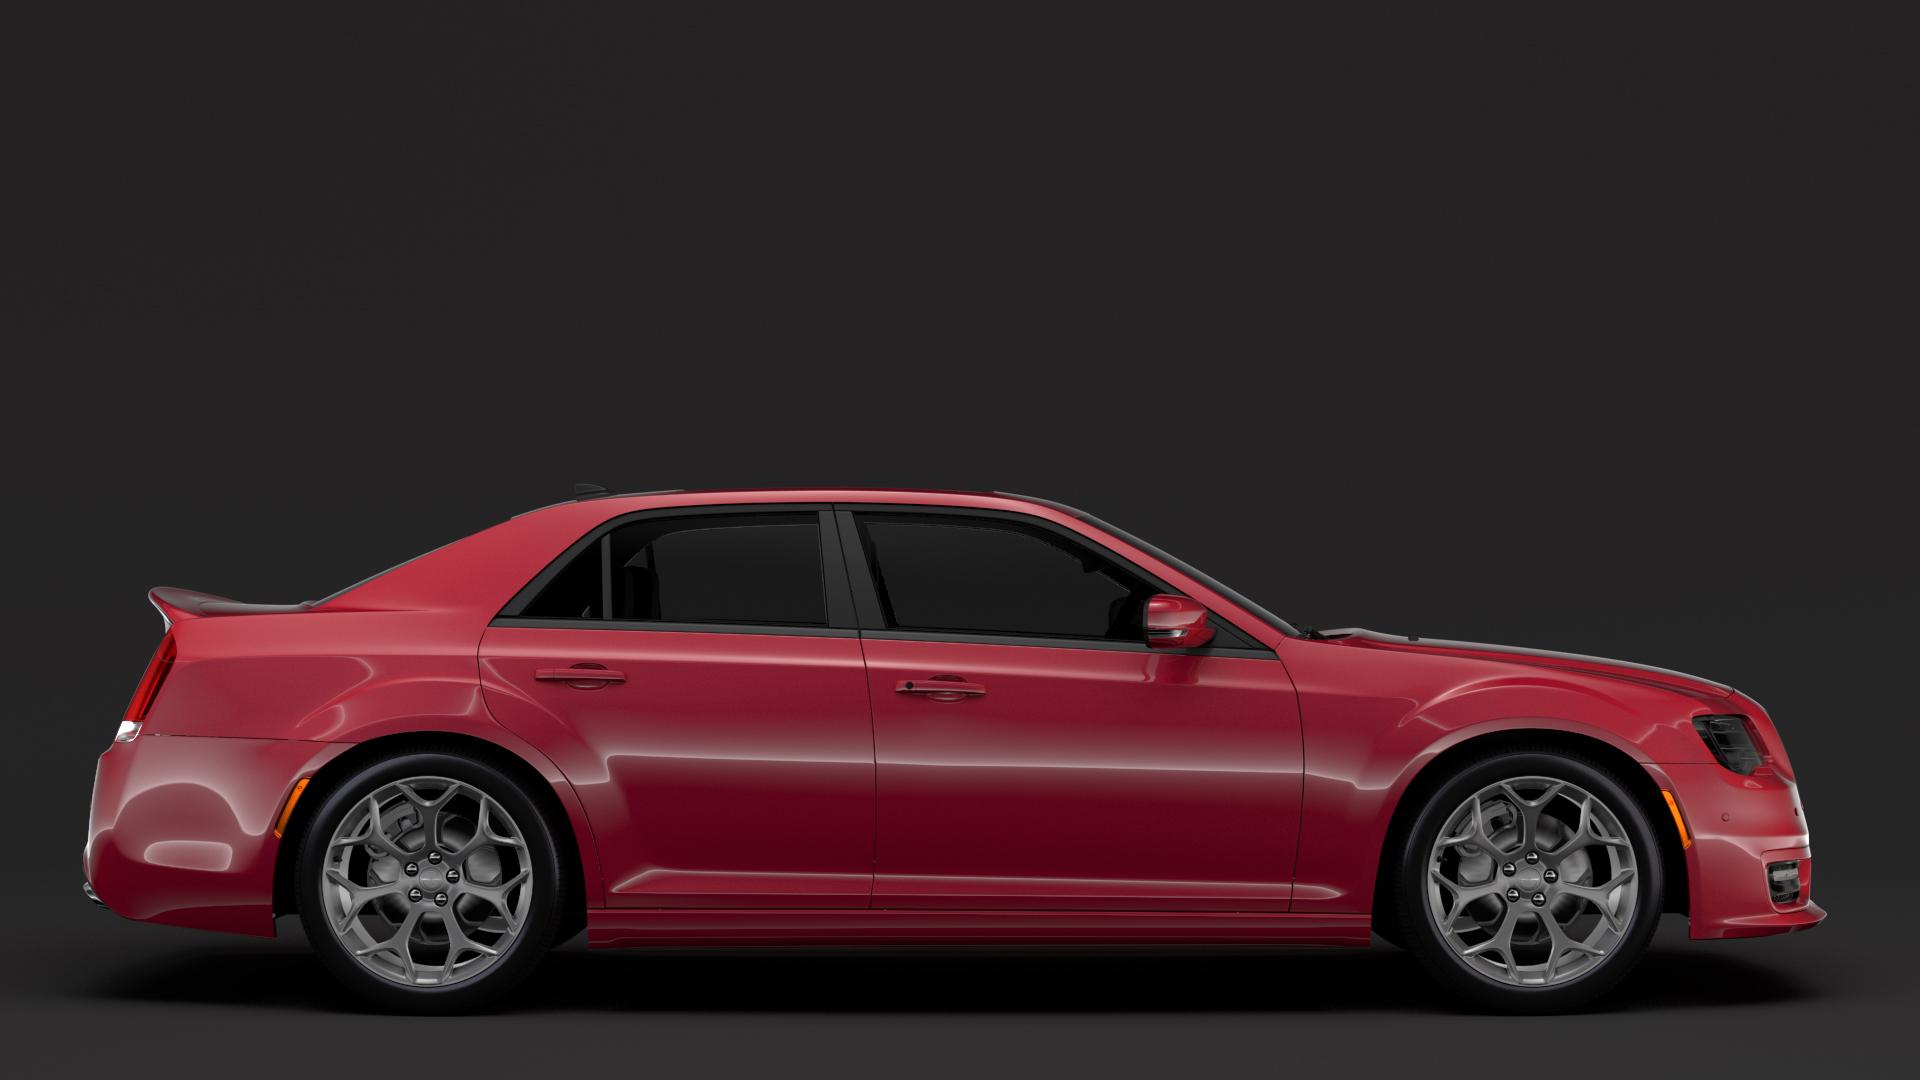 chrysler 300 s sport lx2 2018 3d model 3ds max fbx c4d lwo ma mb hrc xsi obj 284573